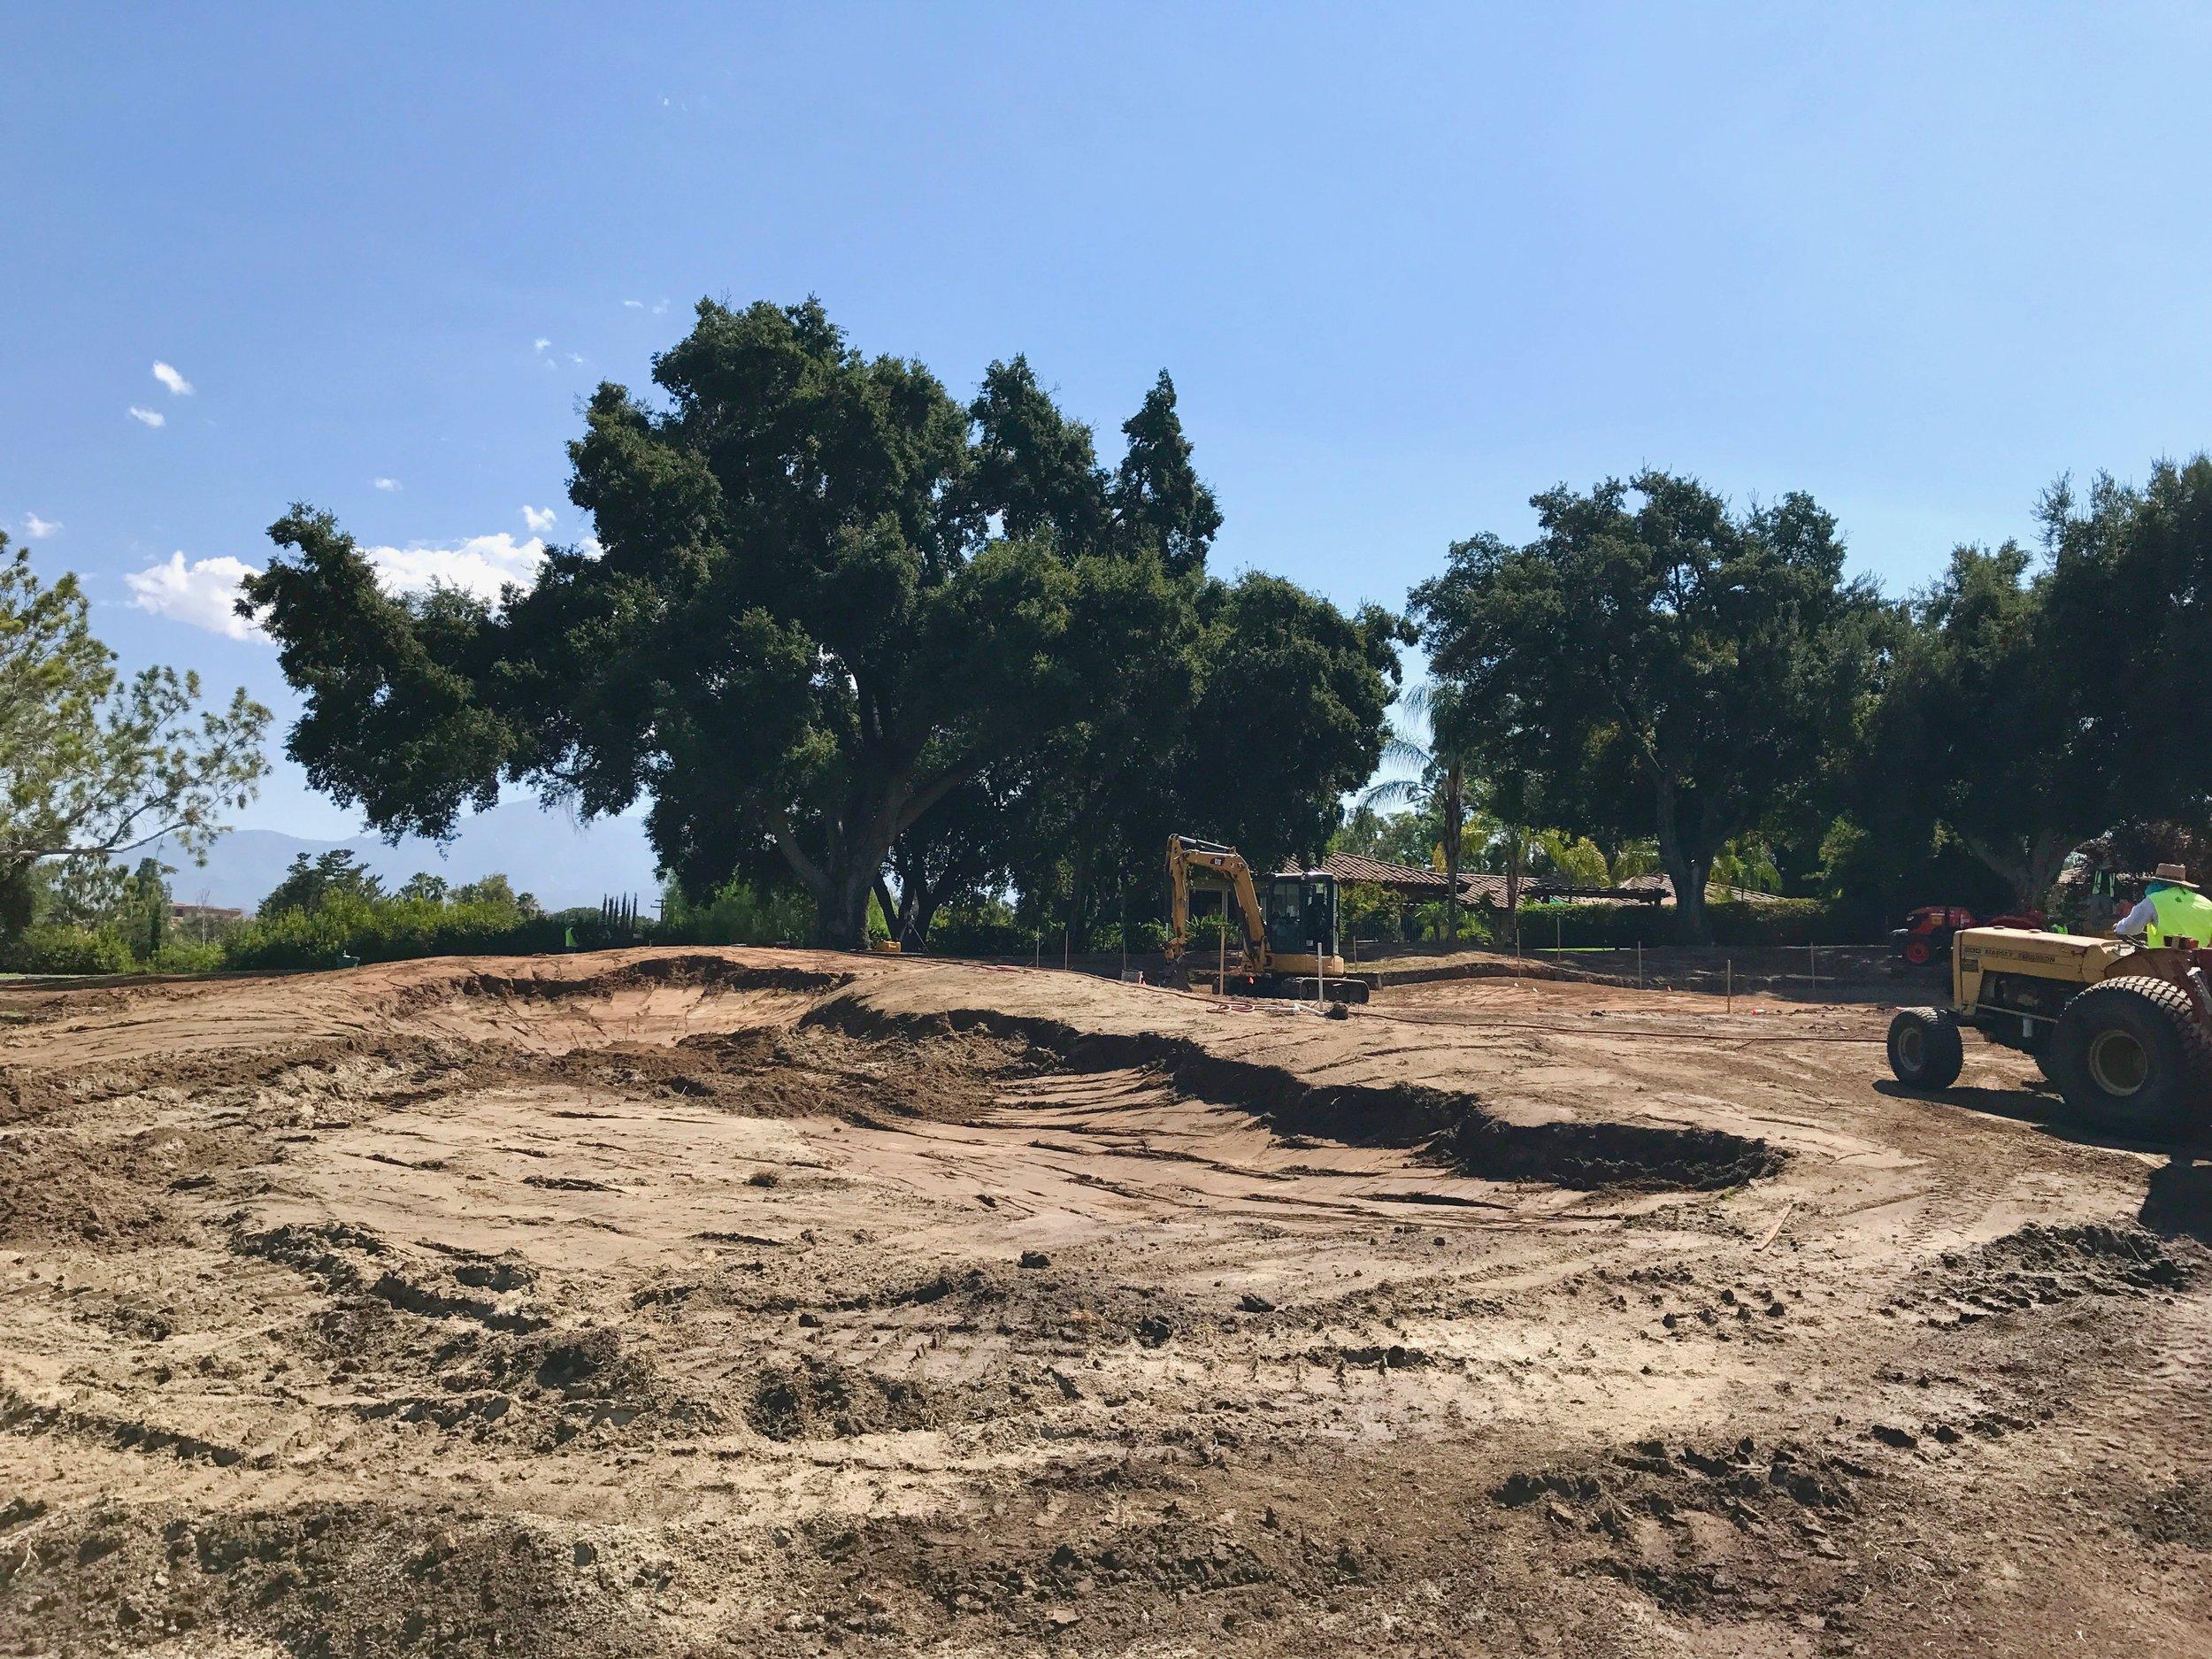 hochstein-design-2017-the-work-redlands-hole-2-left-bunker-progress.jpg